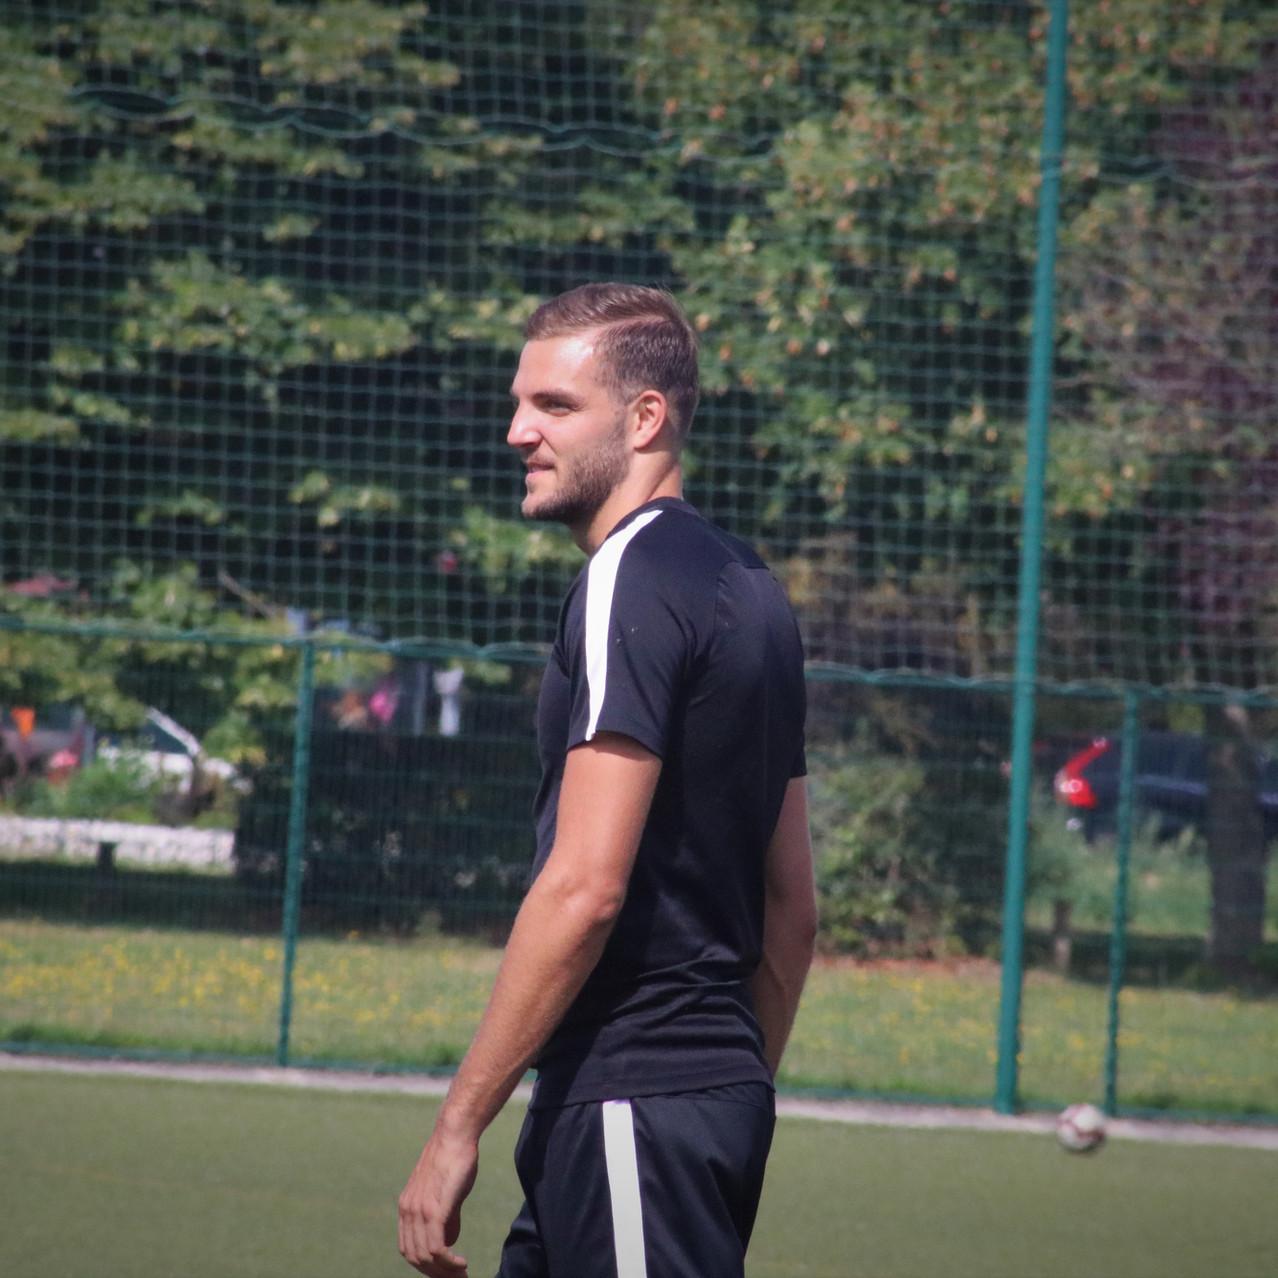 Enzo Bovis